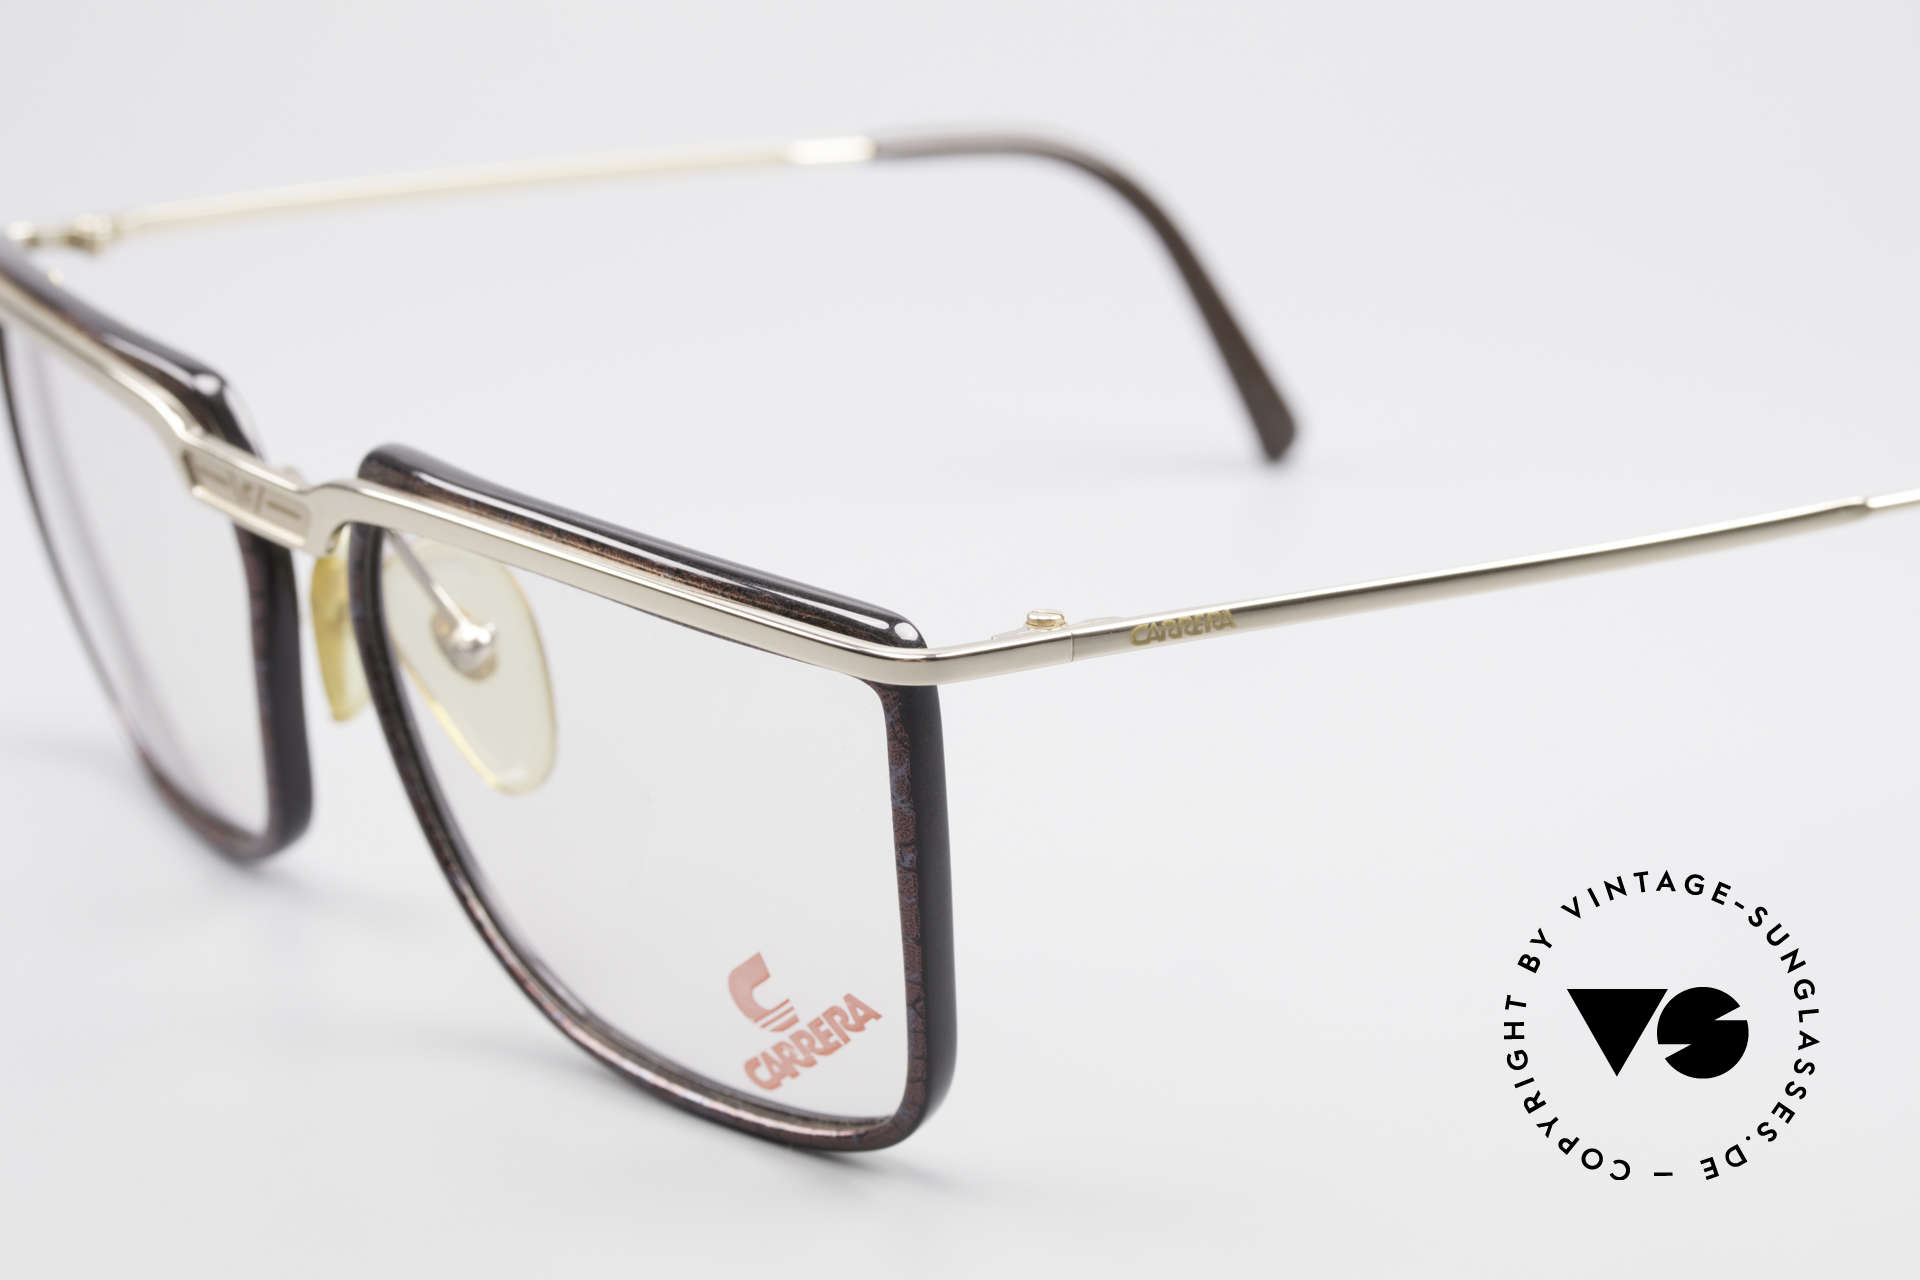 Carrera 5376 Square Vintage Carbon Frame, 1st class frame-coloring: purple/black-marbled, Made for Men